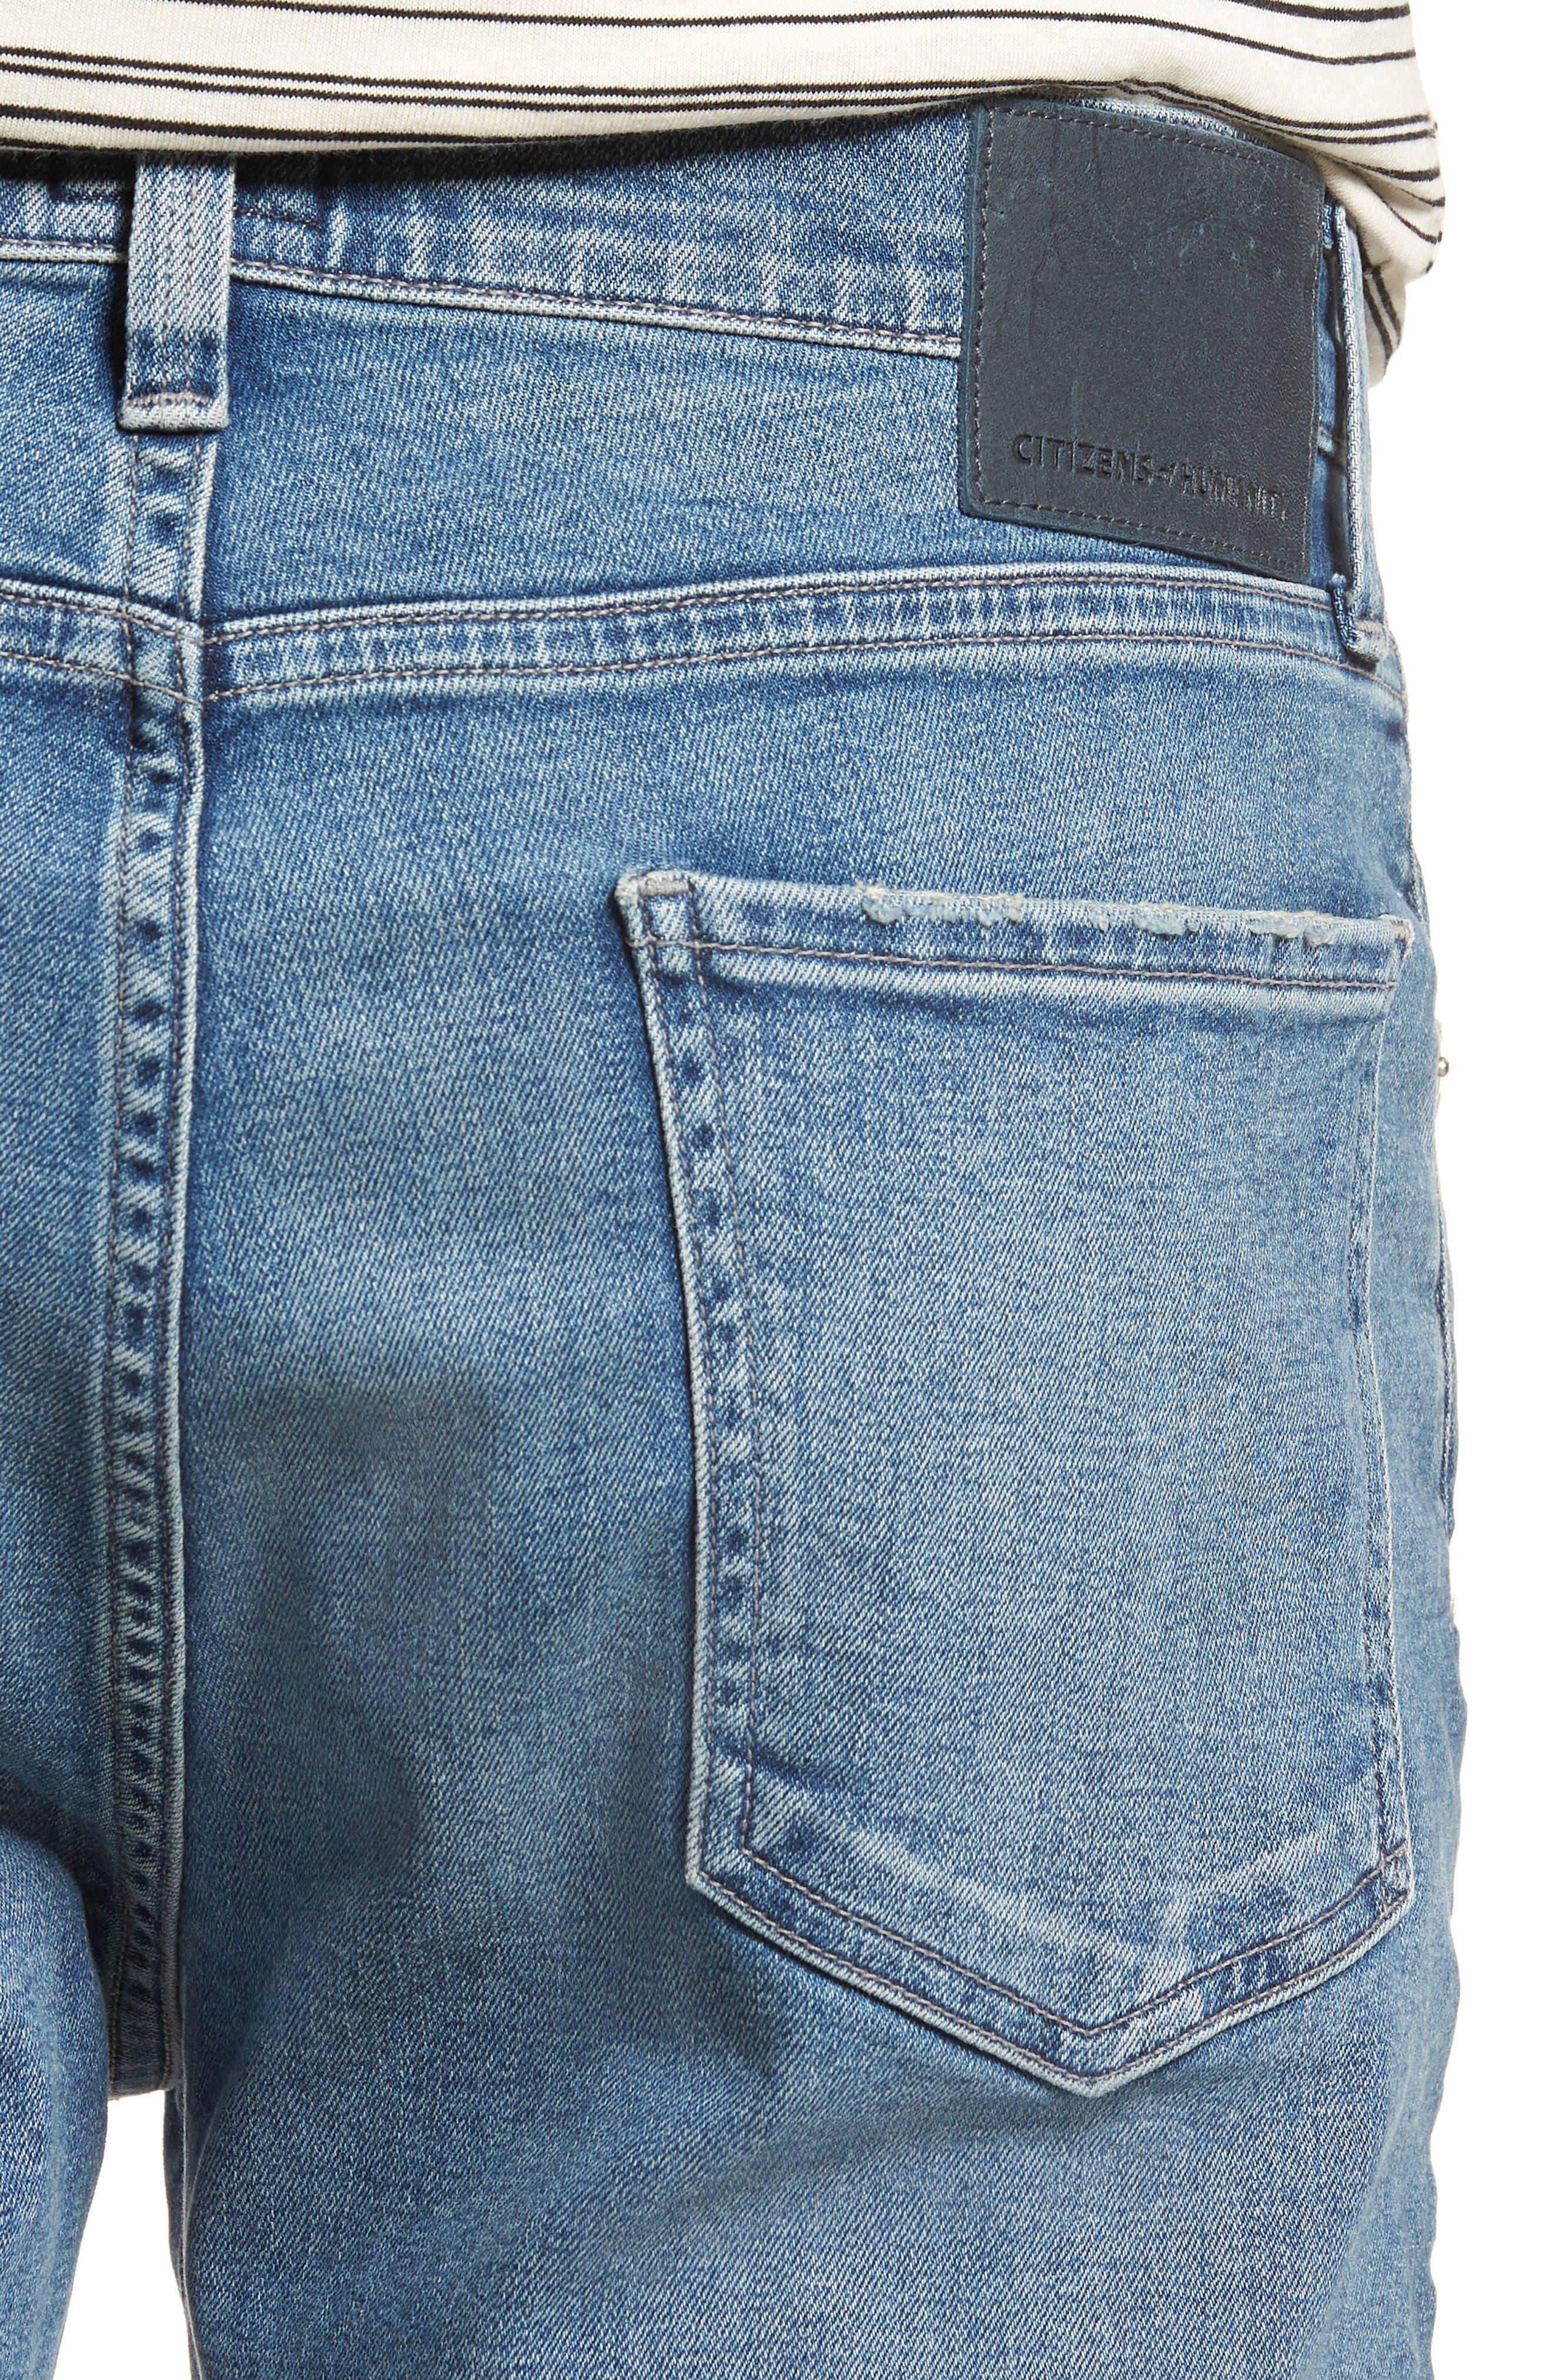 Perform - Gage Slim Straight Leg Jeans,                             Alternate thumbnail 4, color,                             473